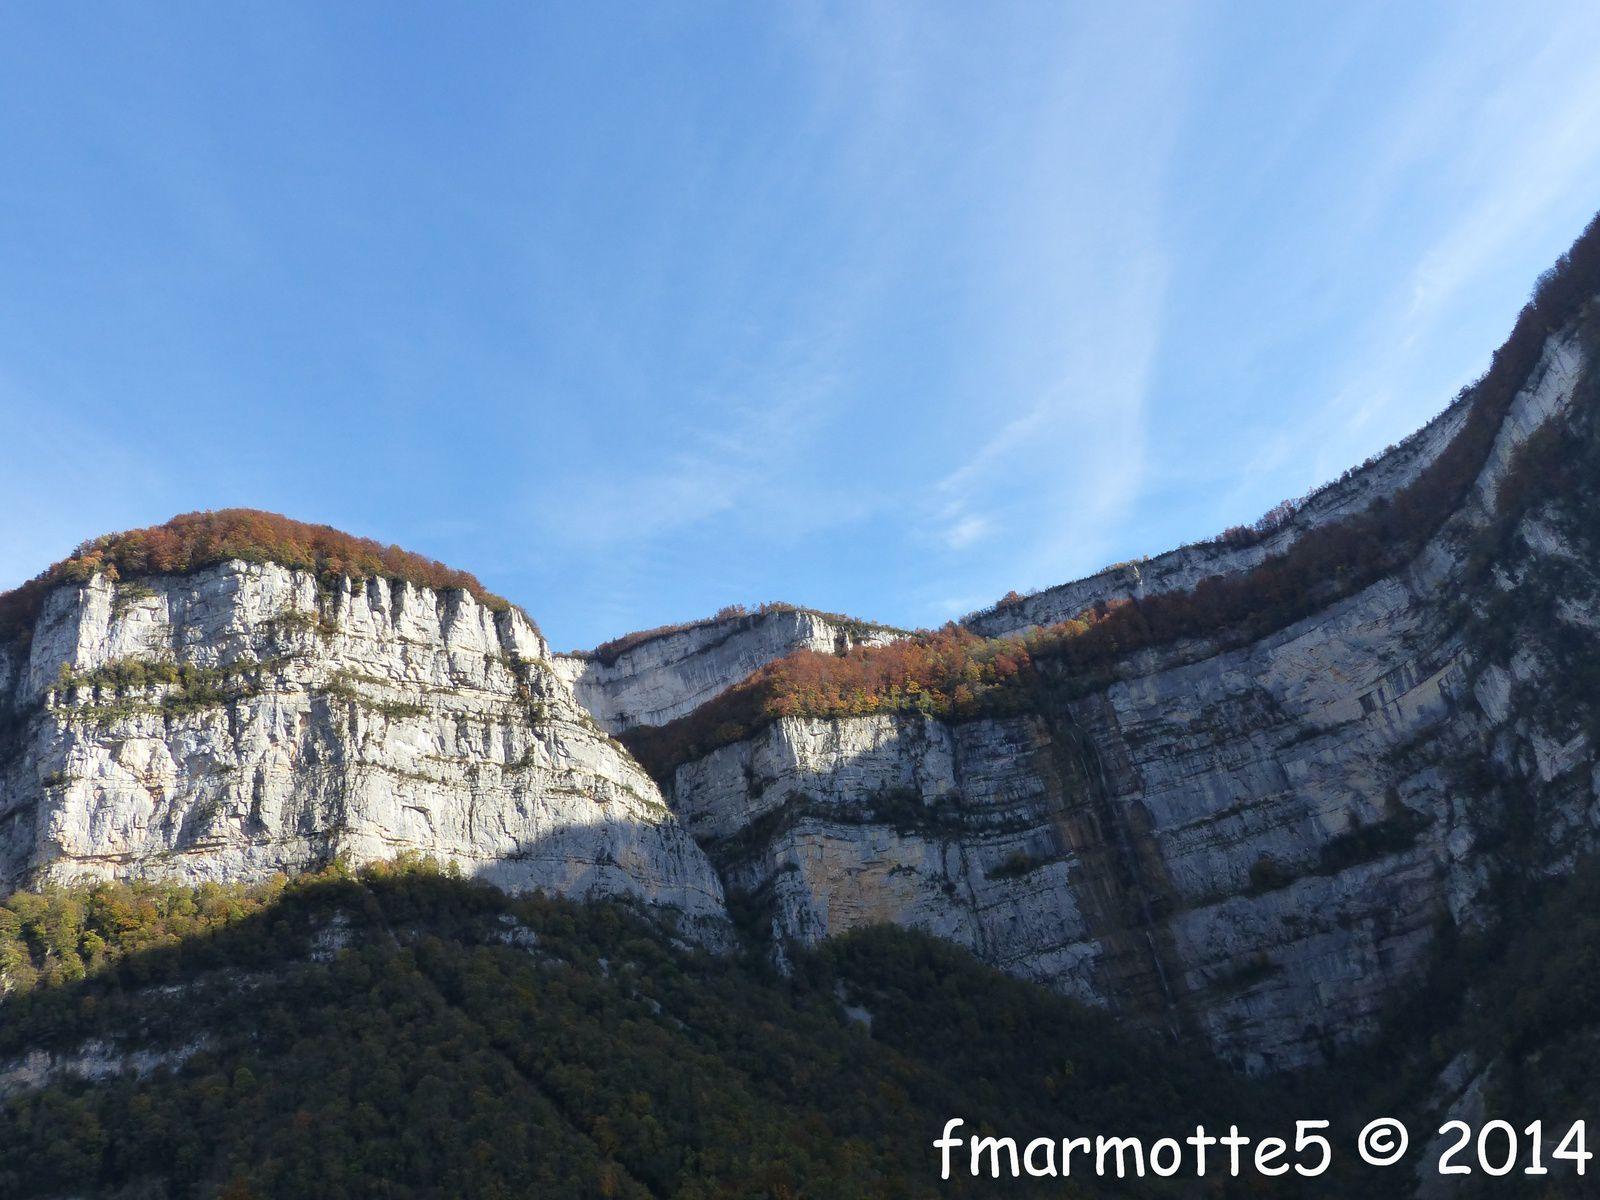 Le cirque du Bournillon depuis l'esplanade des Grottes de Choranche.